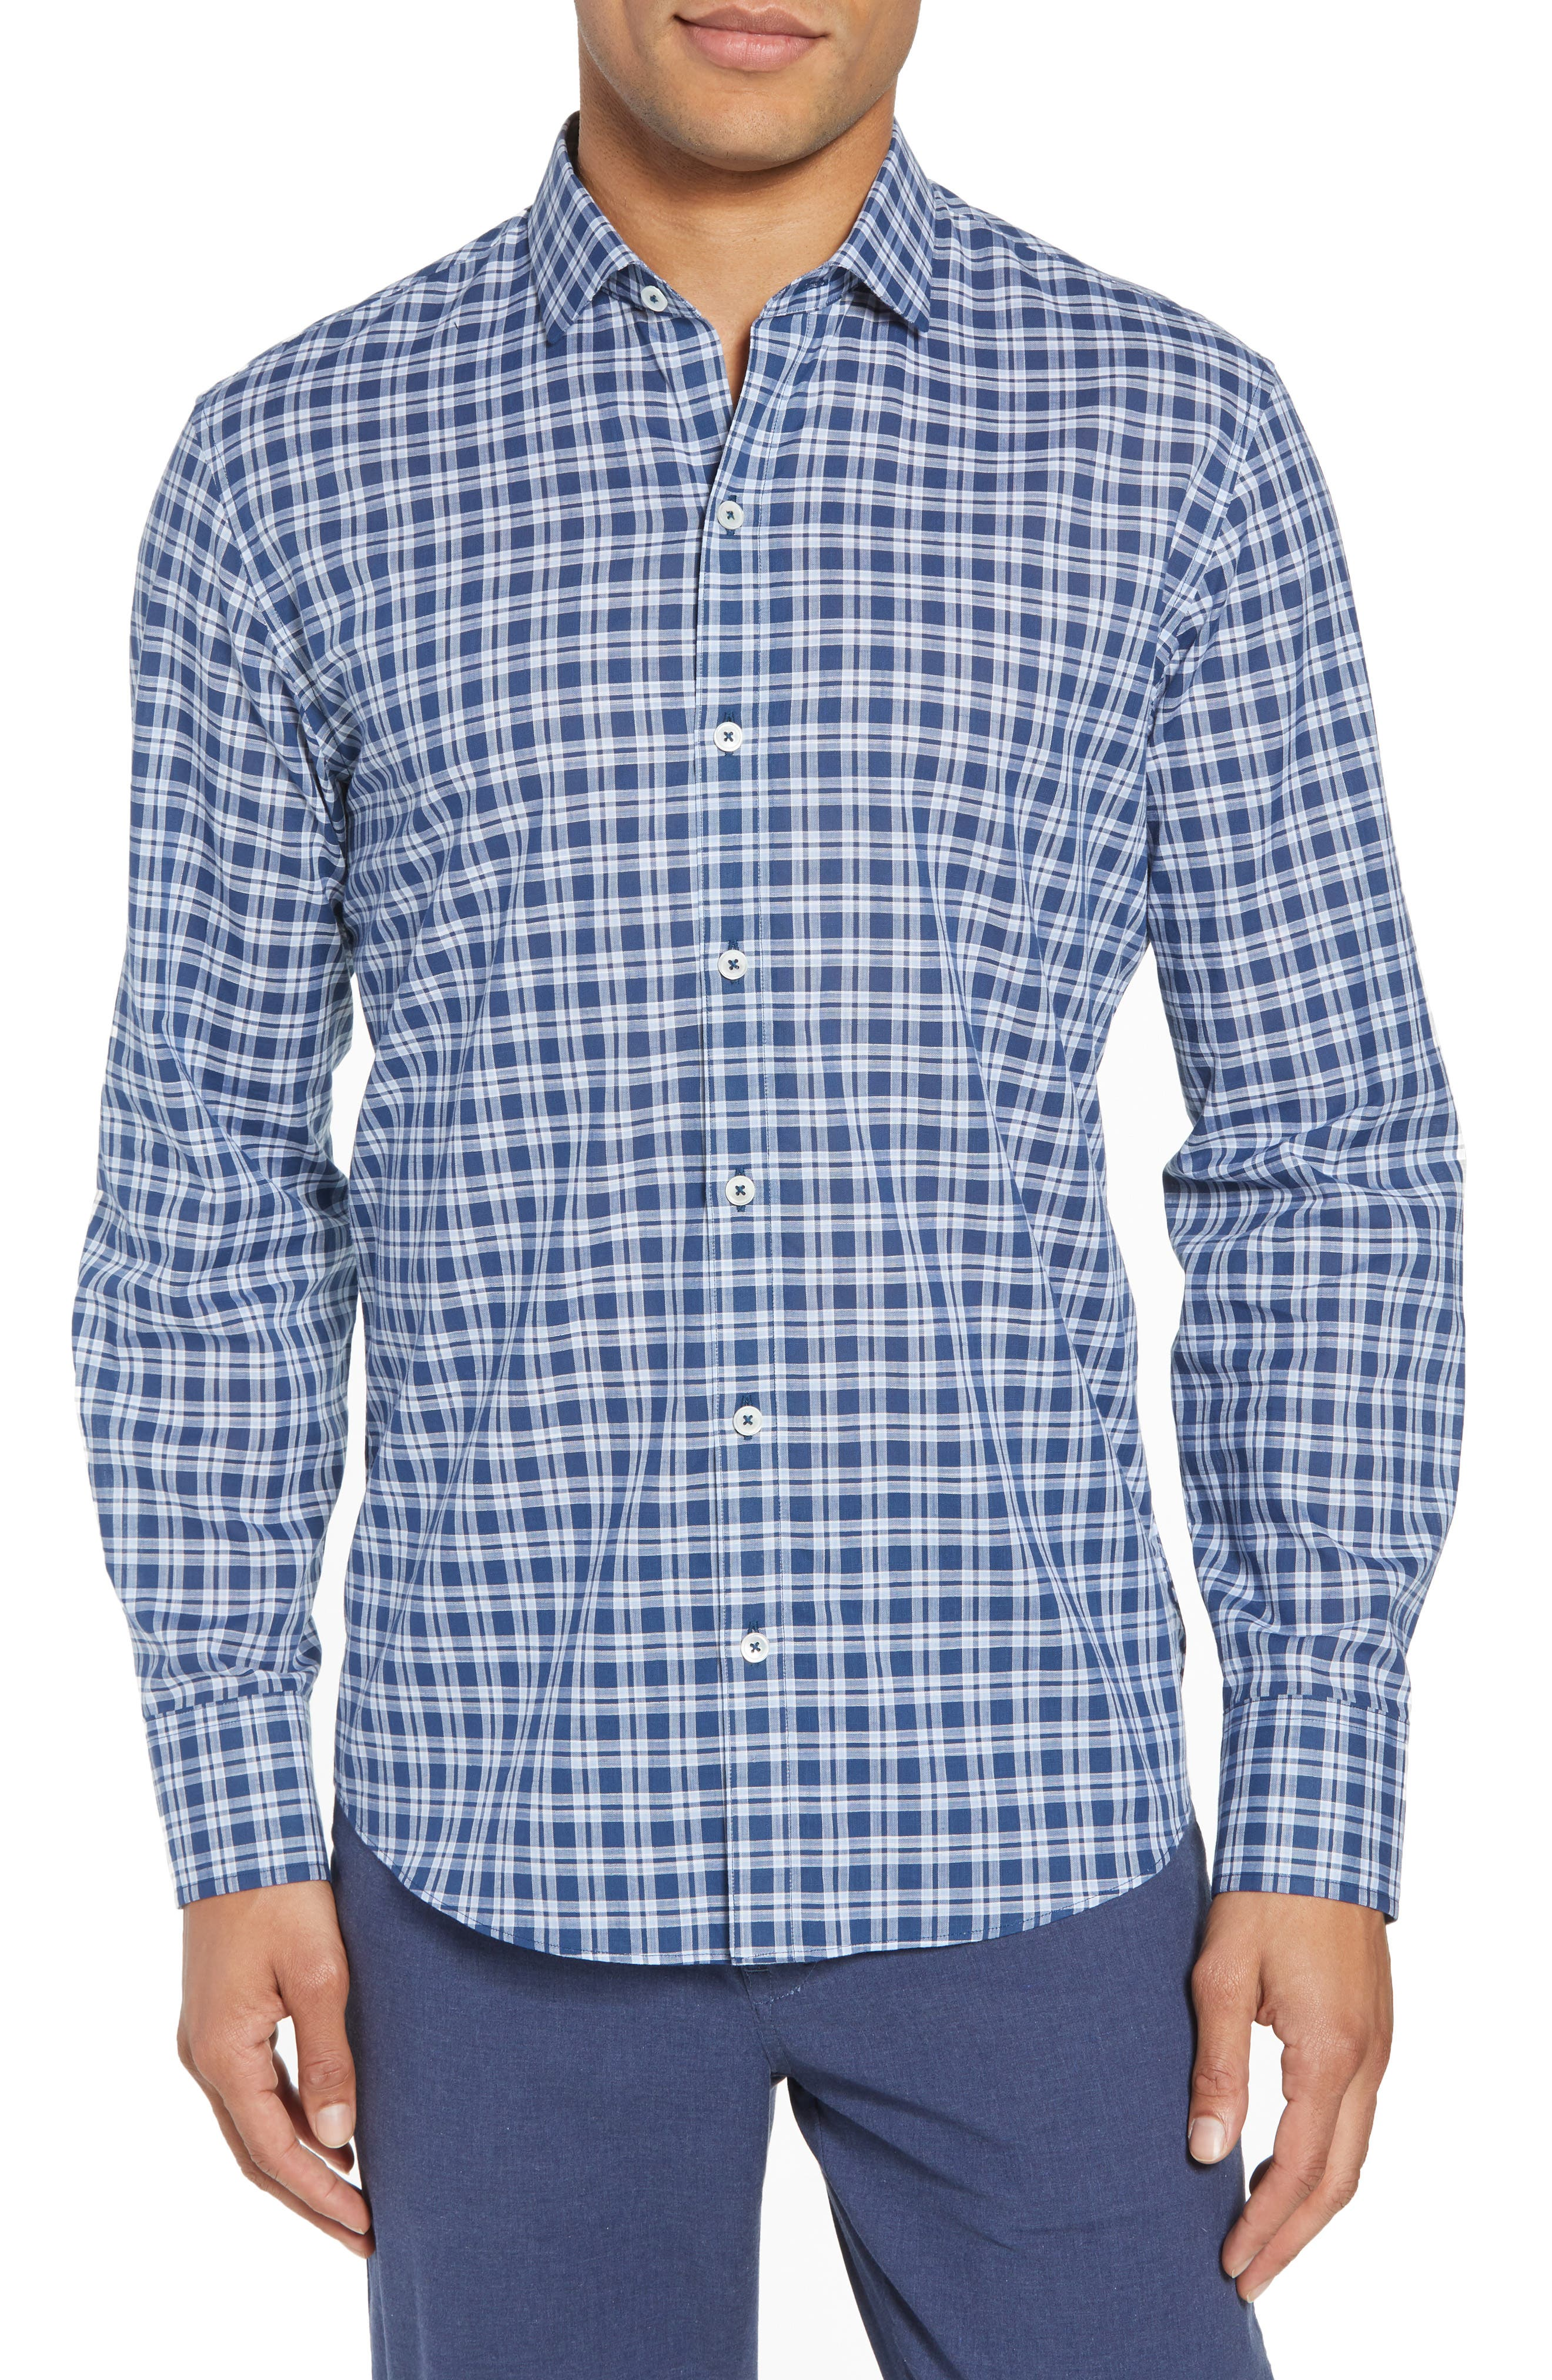 Speer Regular Fit Sport Shirt,                             Main thumbnail 1, color,                             424